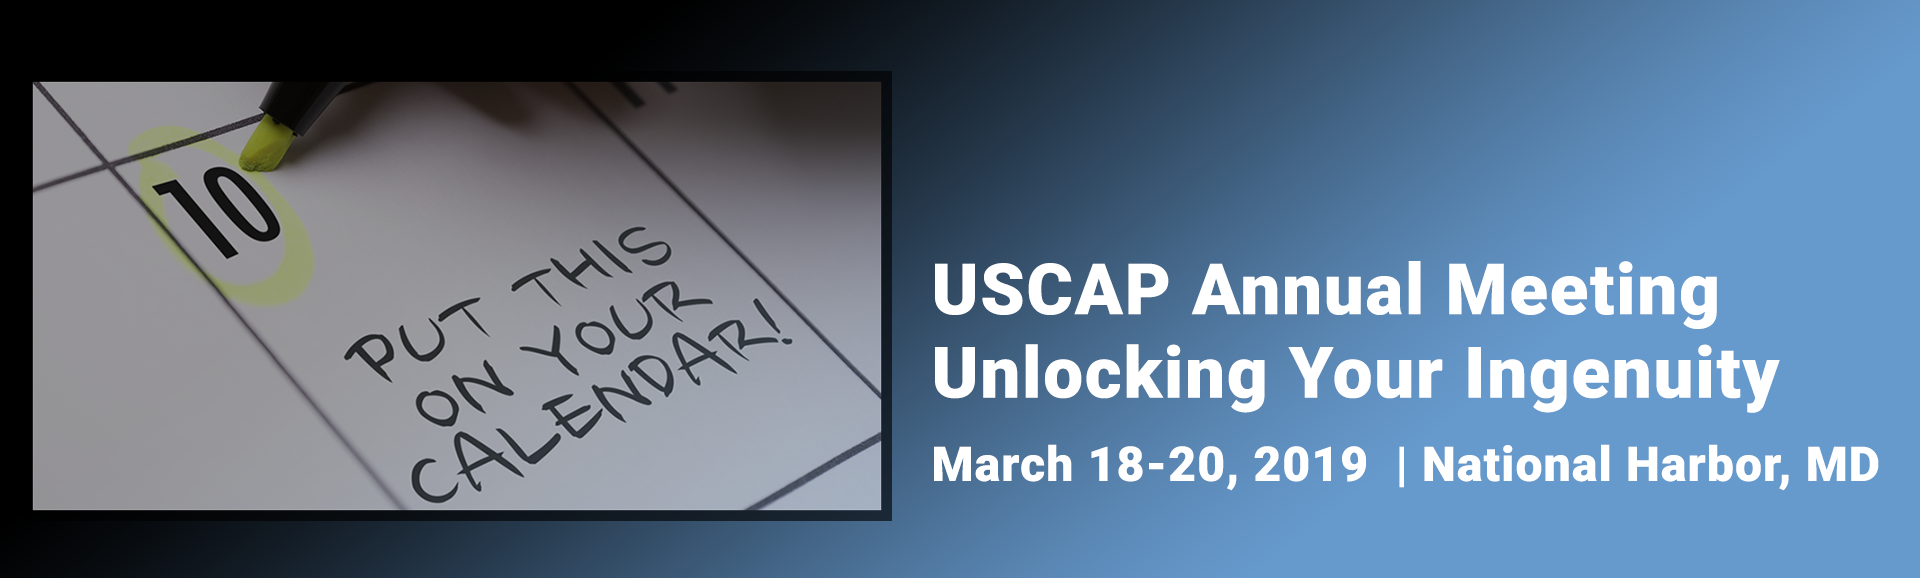 Calendar-Notice-Header-USCAP